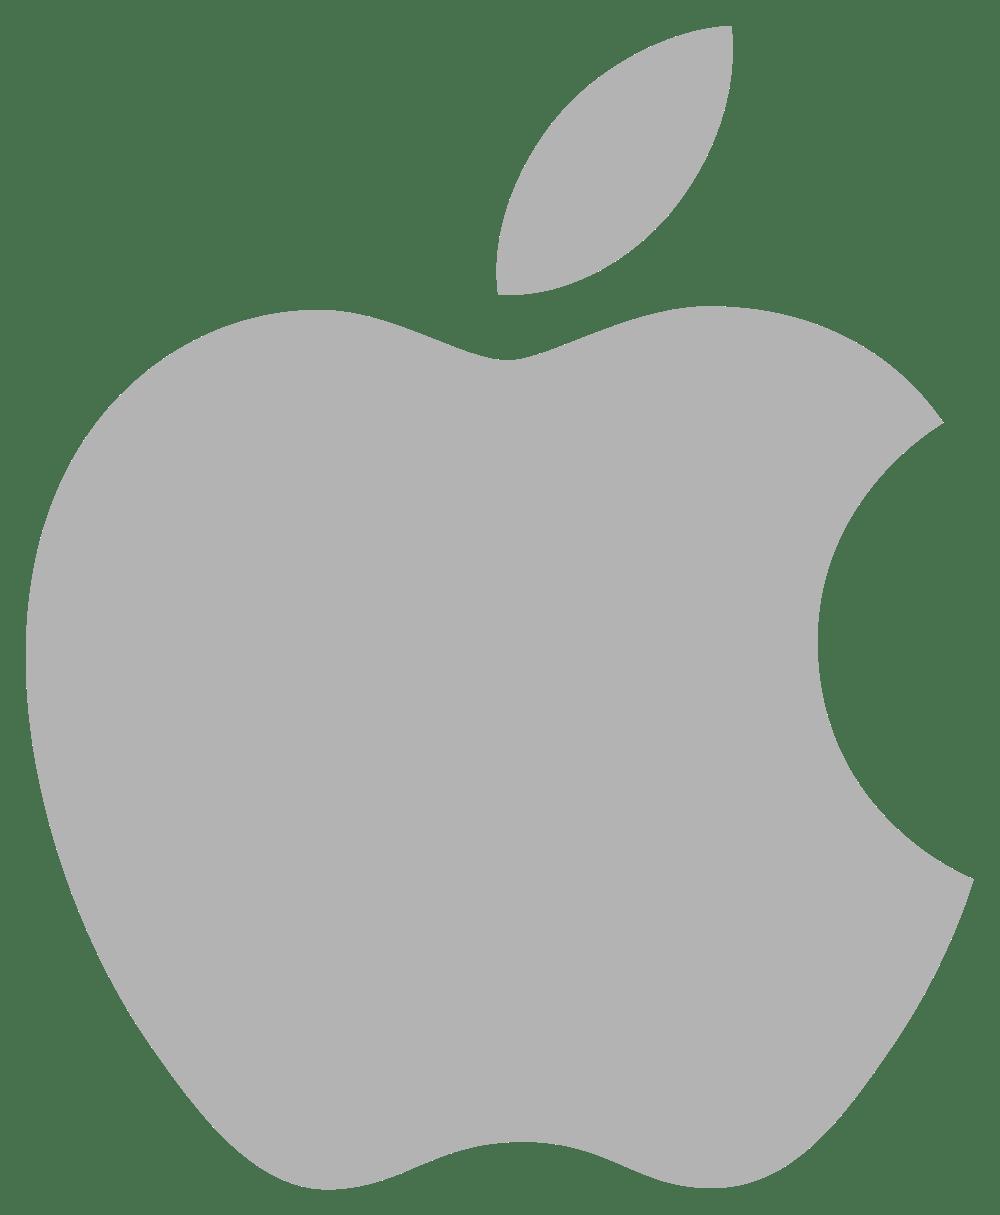 Apple coming to Iowa